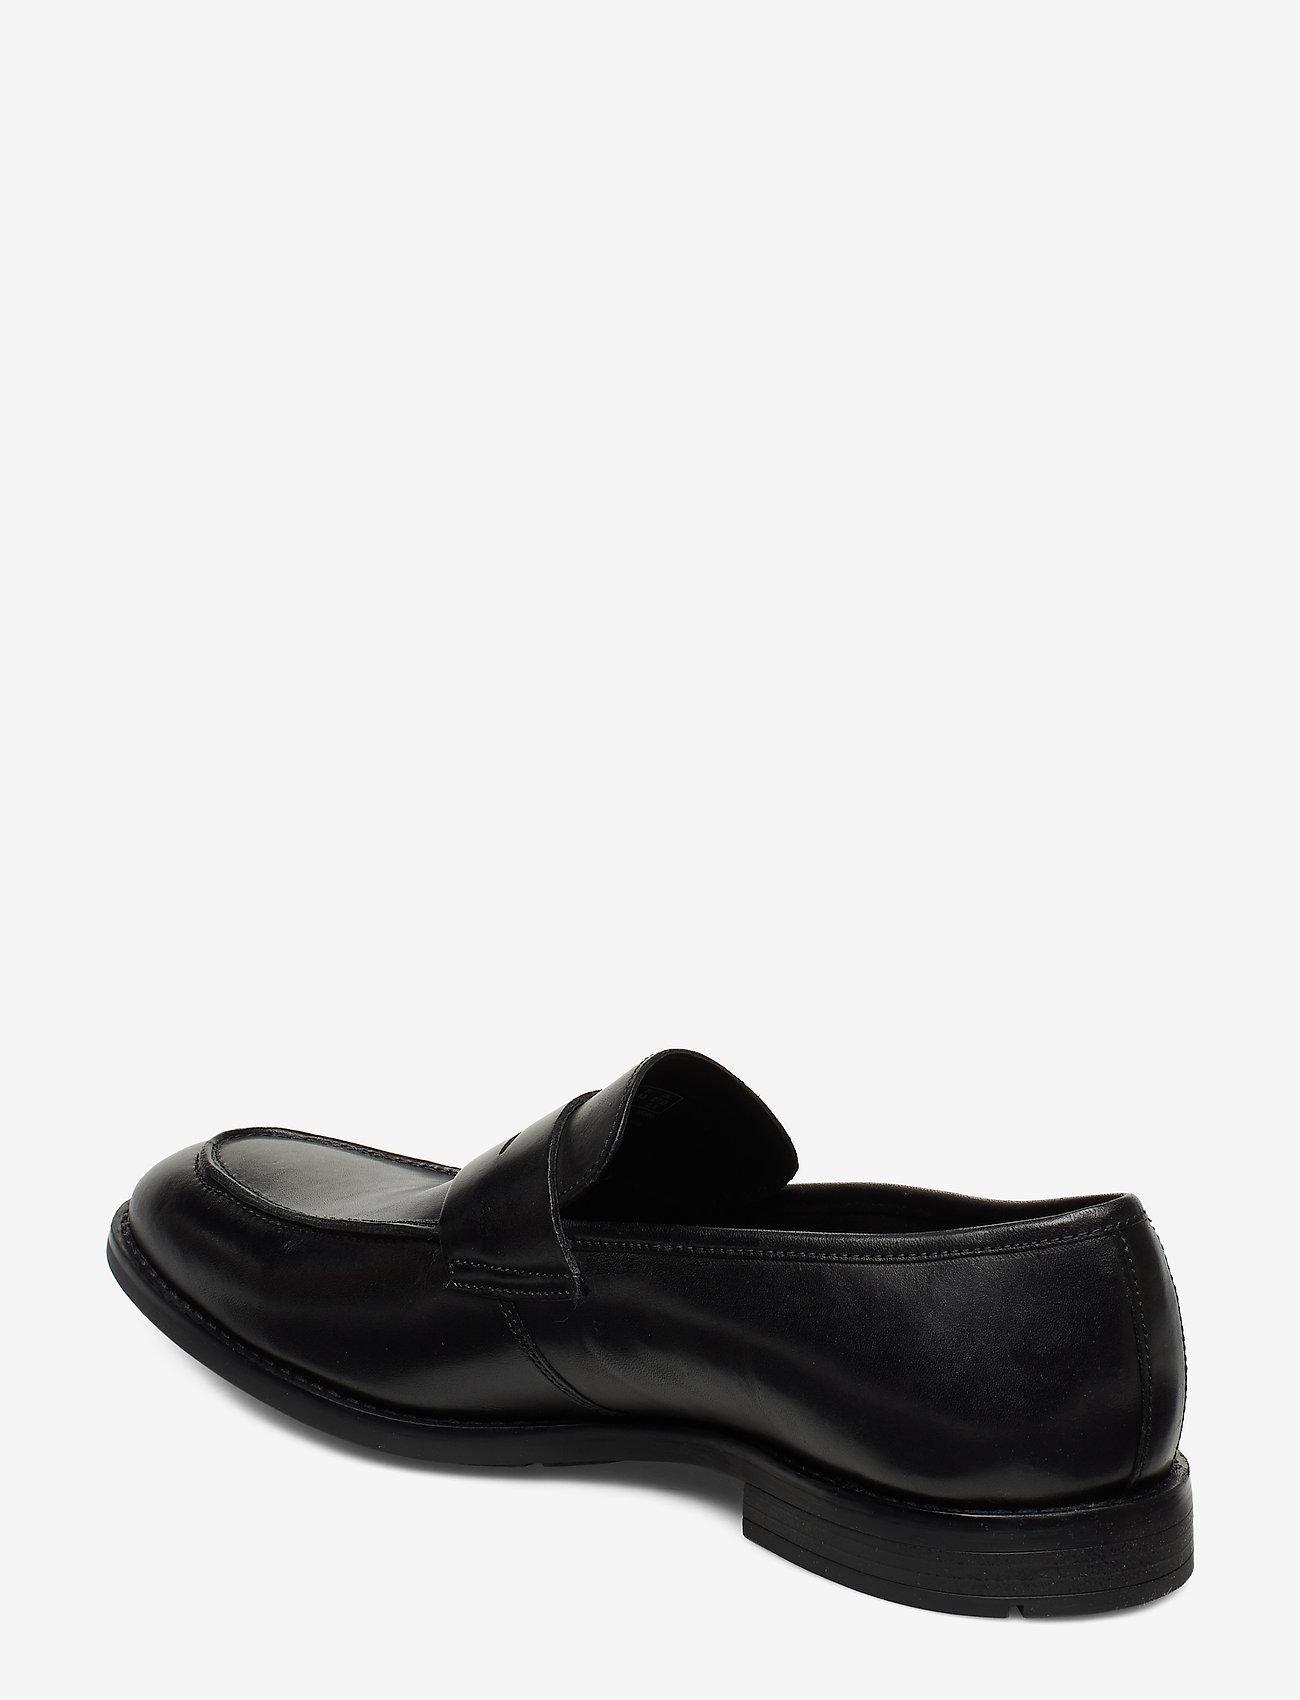 Ronnie Step (Black Leather) - Clarks